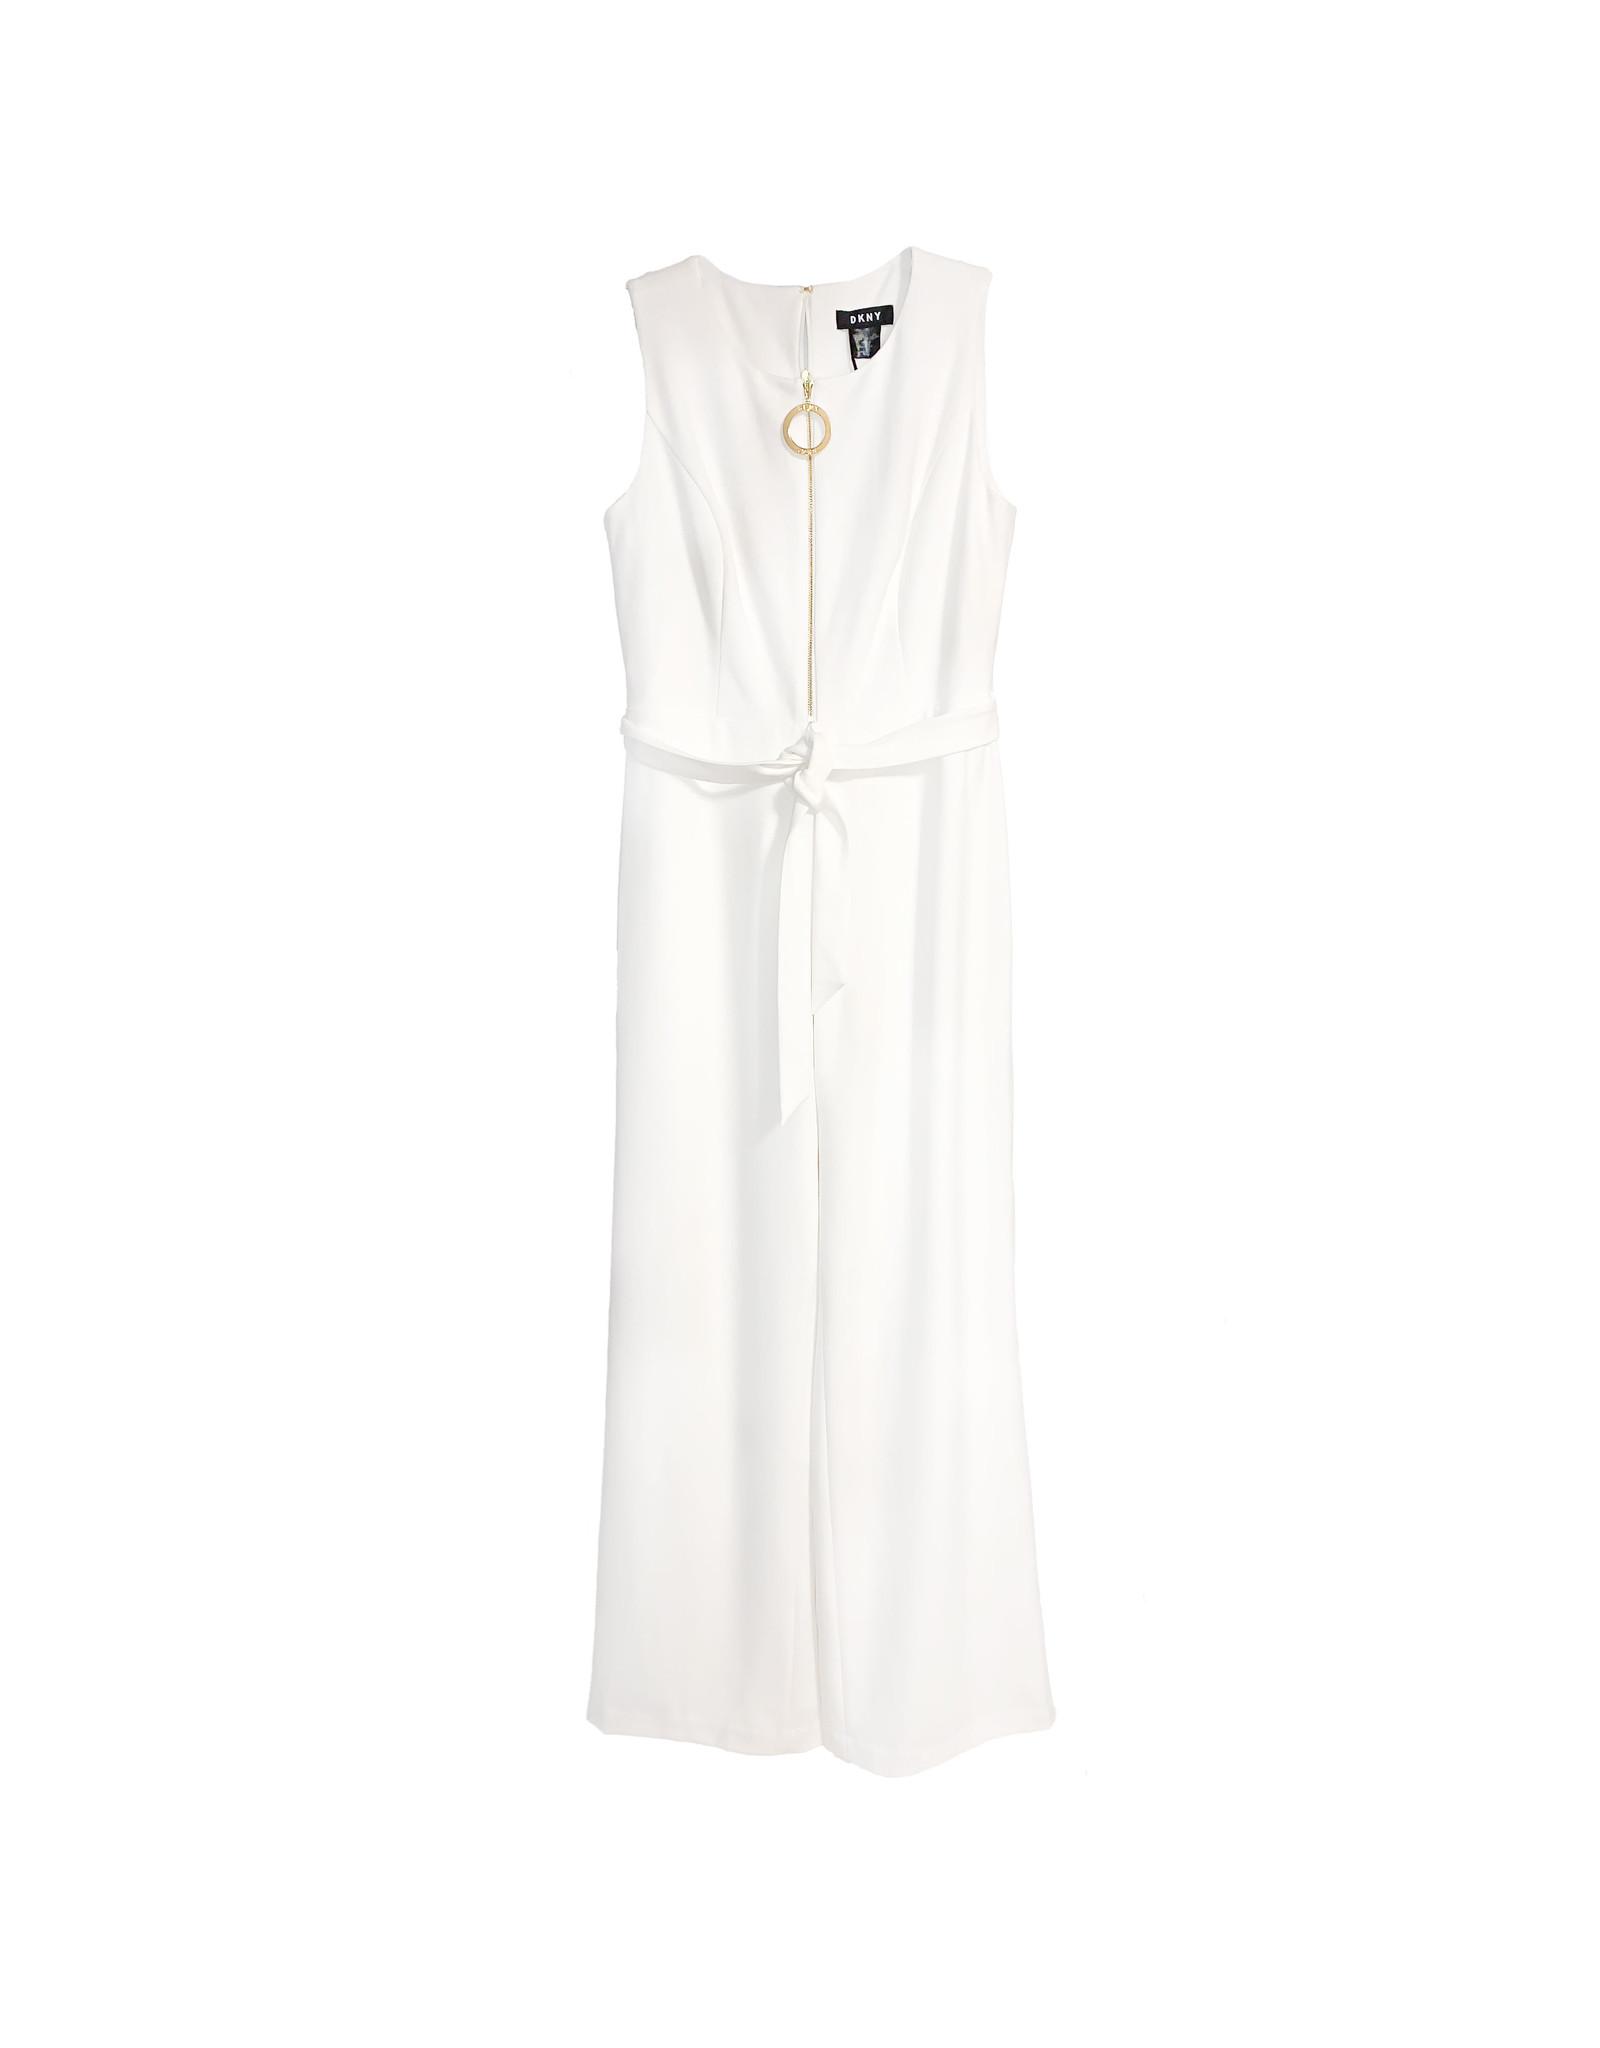 DKNY DKNY  White Logo-Zip Sleeveless Wide-Leg Belt Jumpsuit Size 8